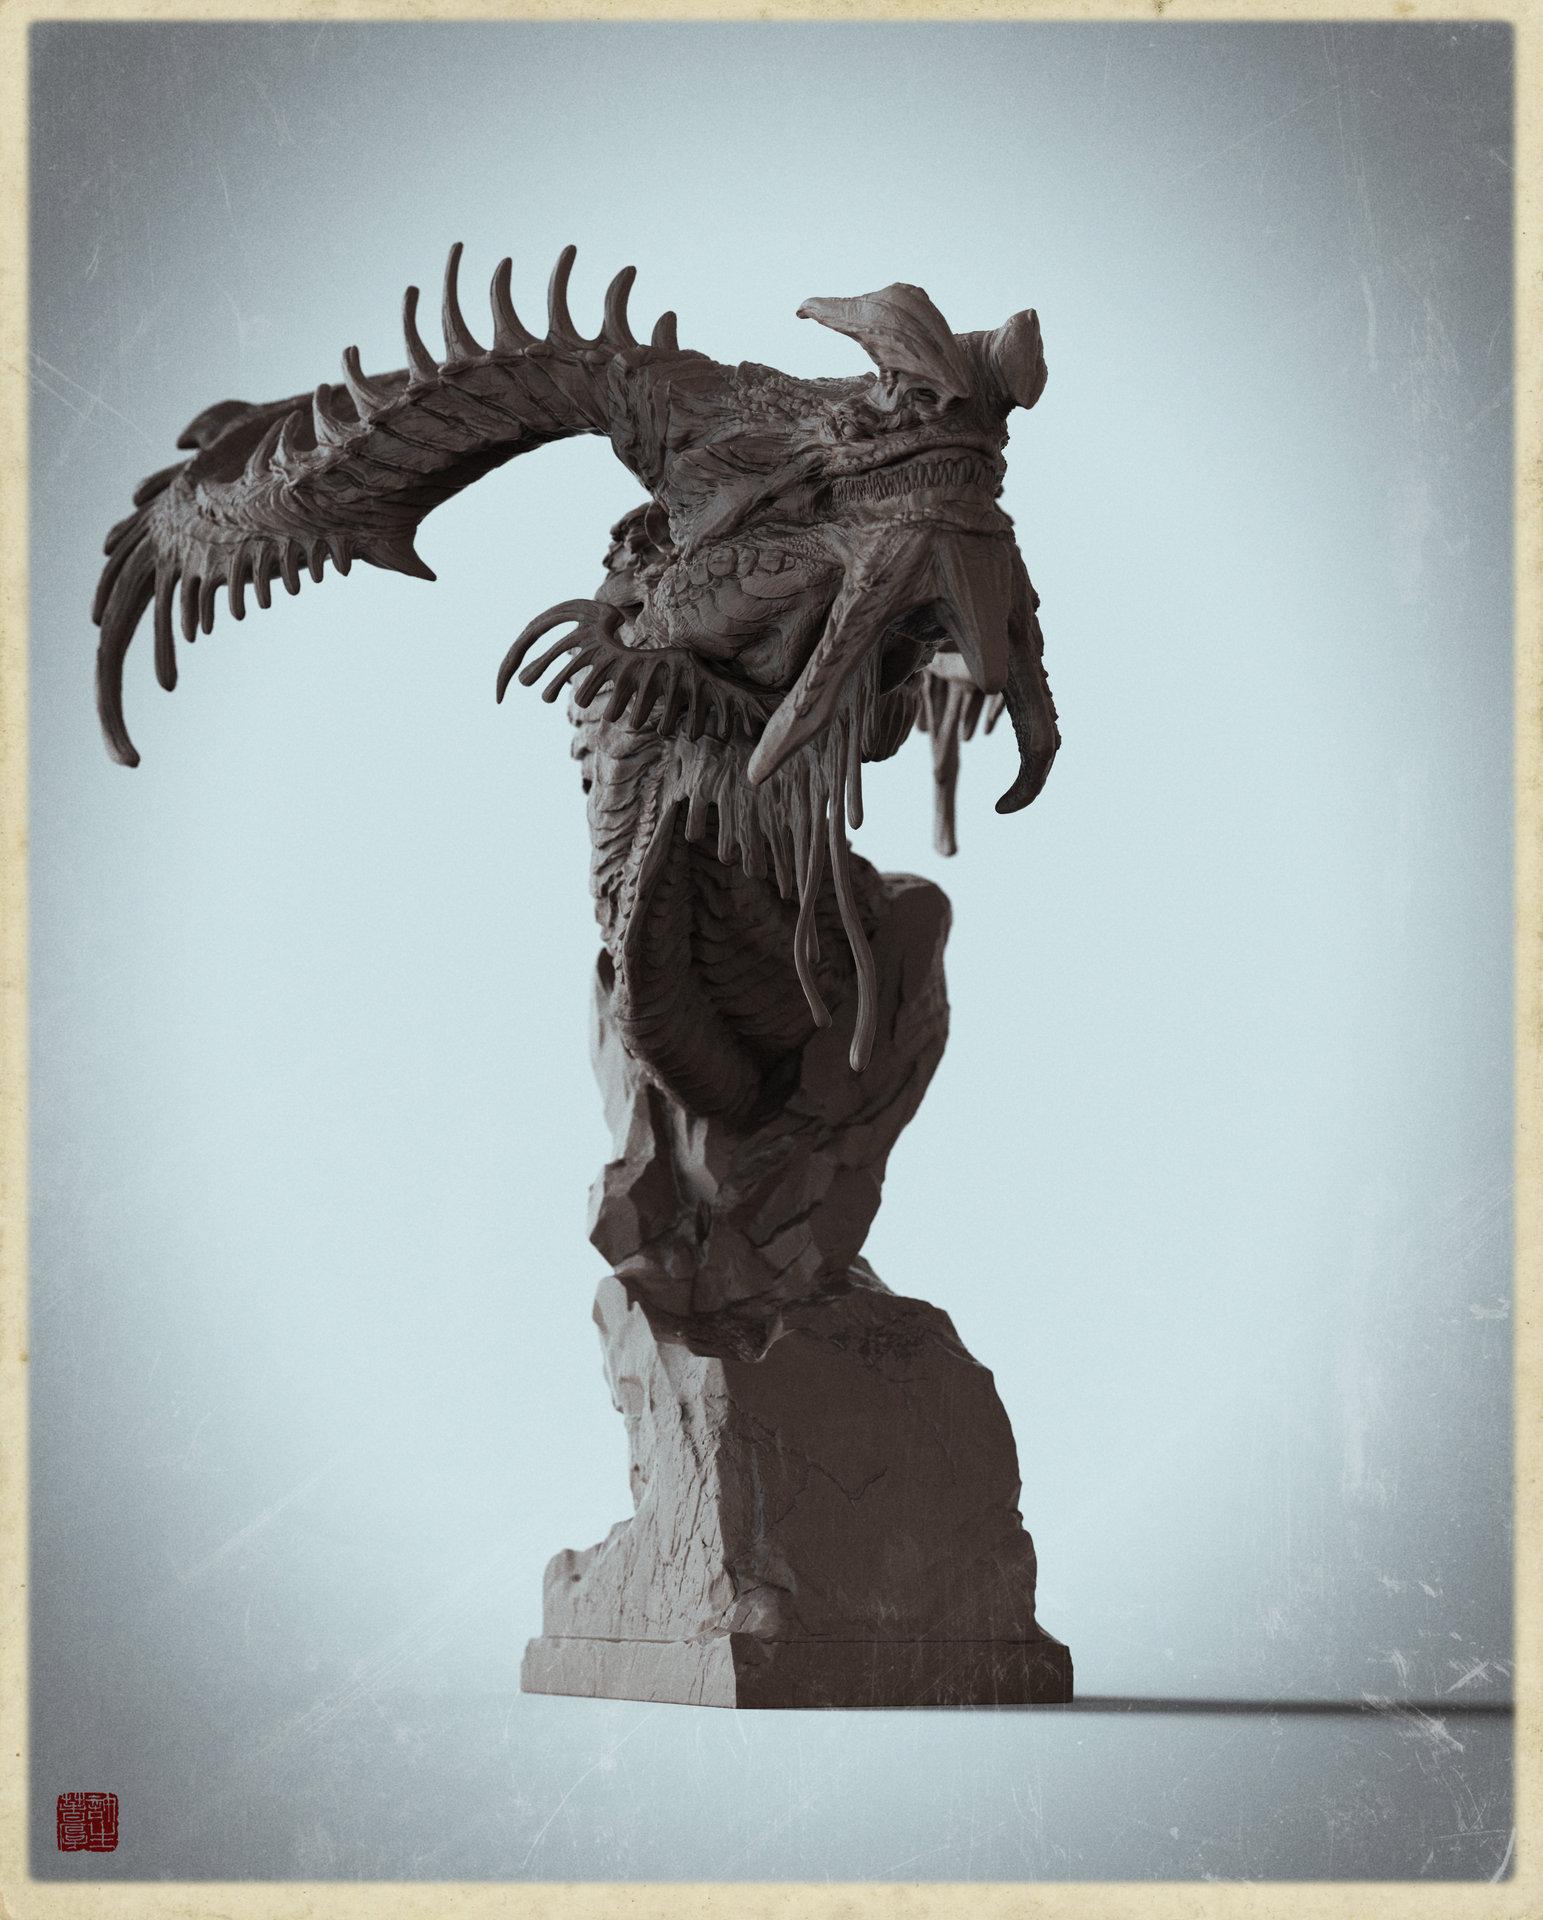 Zhelong xu u dragon clayvesion 2